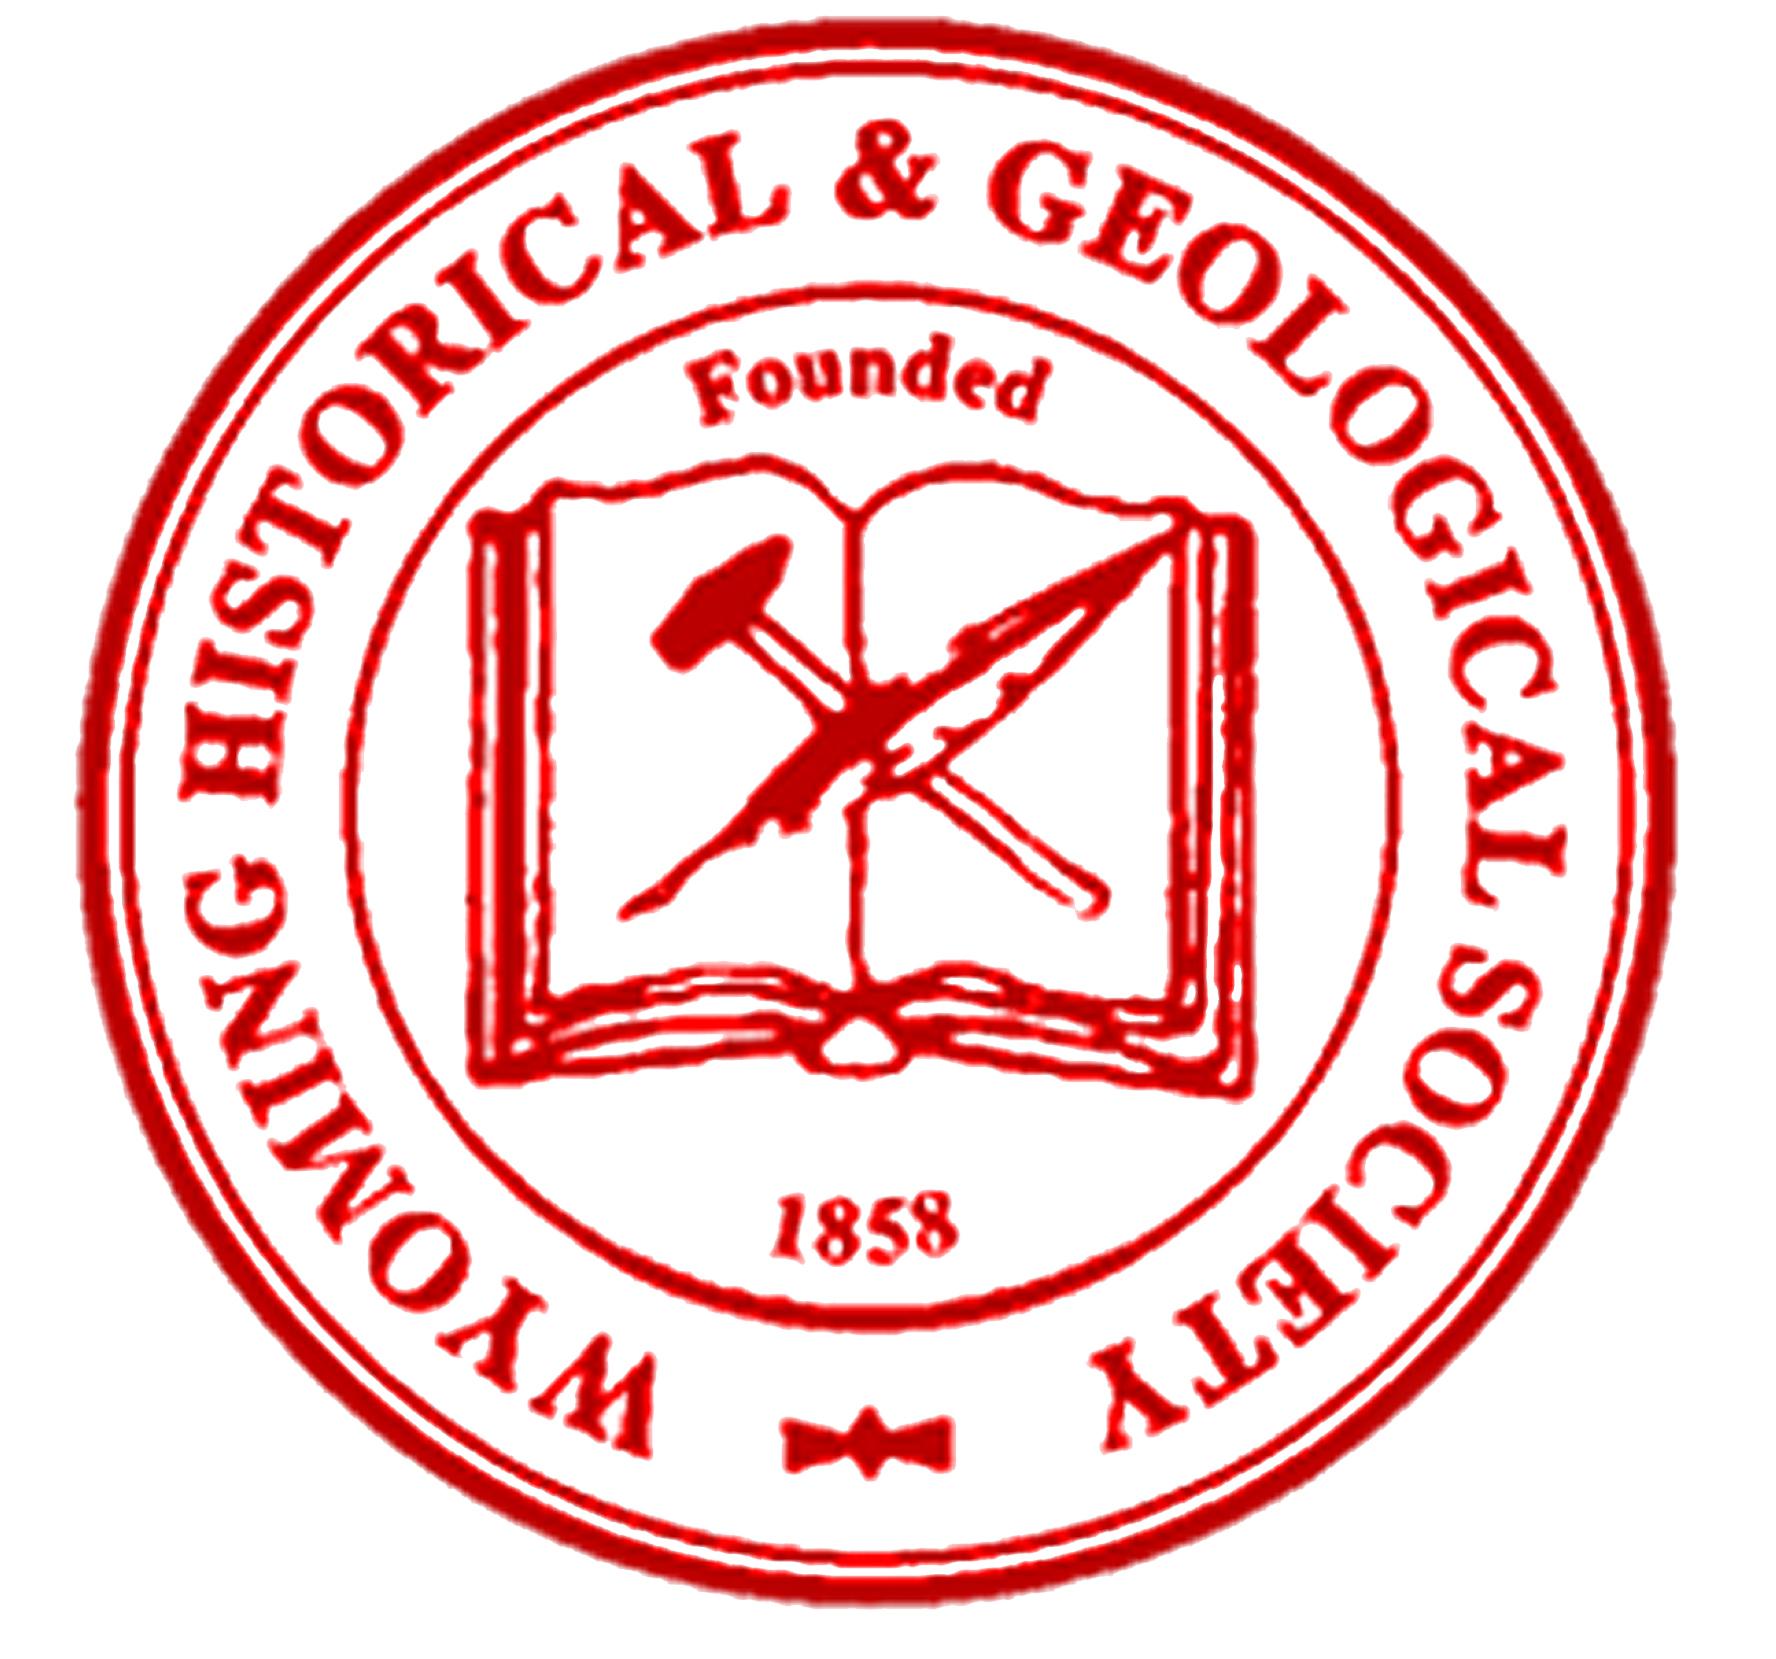 LCHS-logo-large.jpg